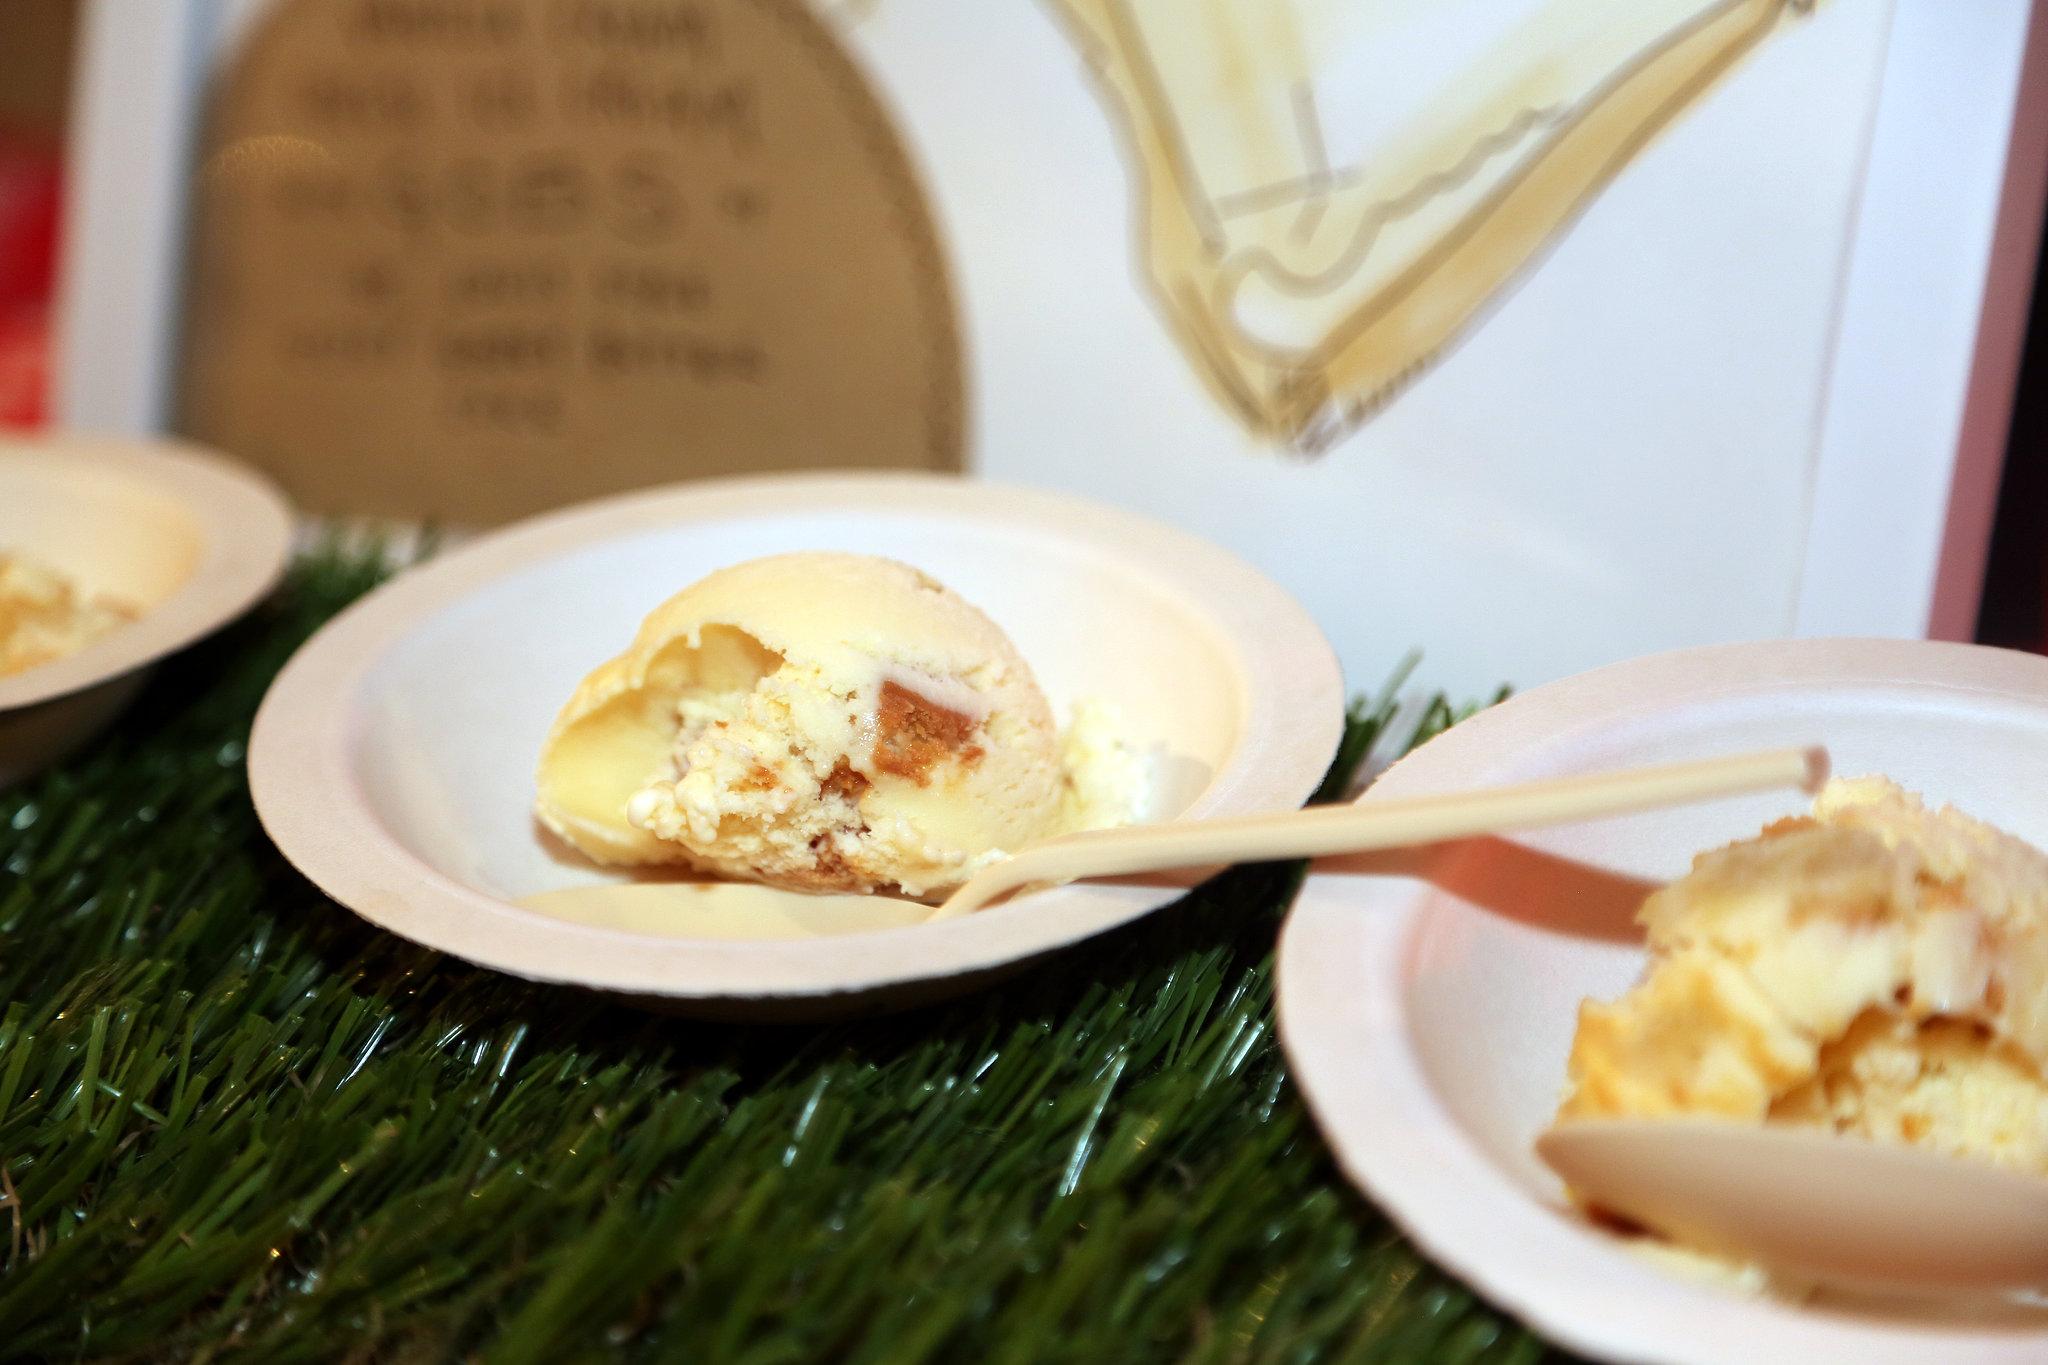 Ample Hills Creamery Ooey Gooey Butter Cake